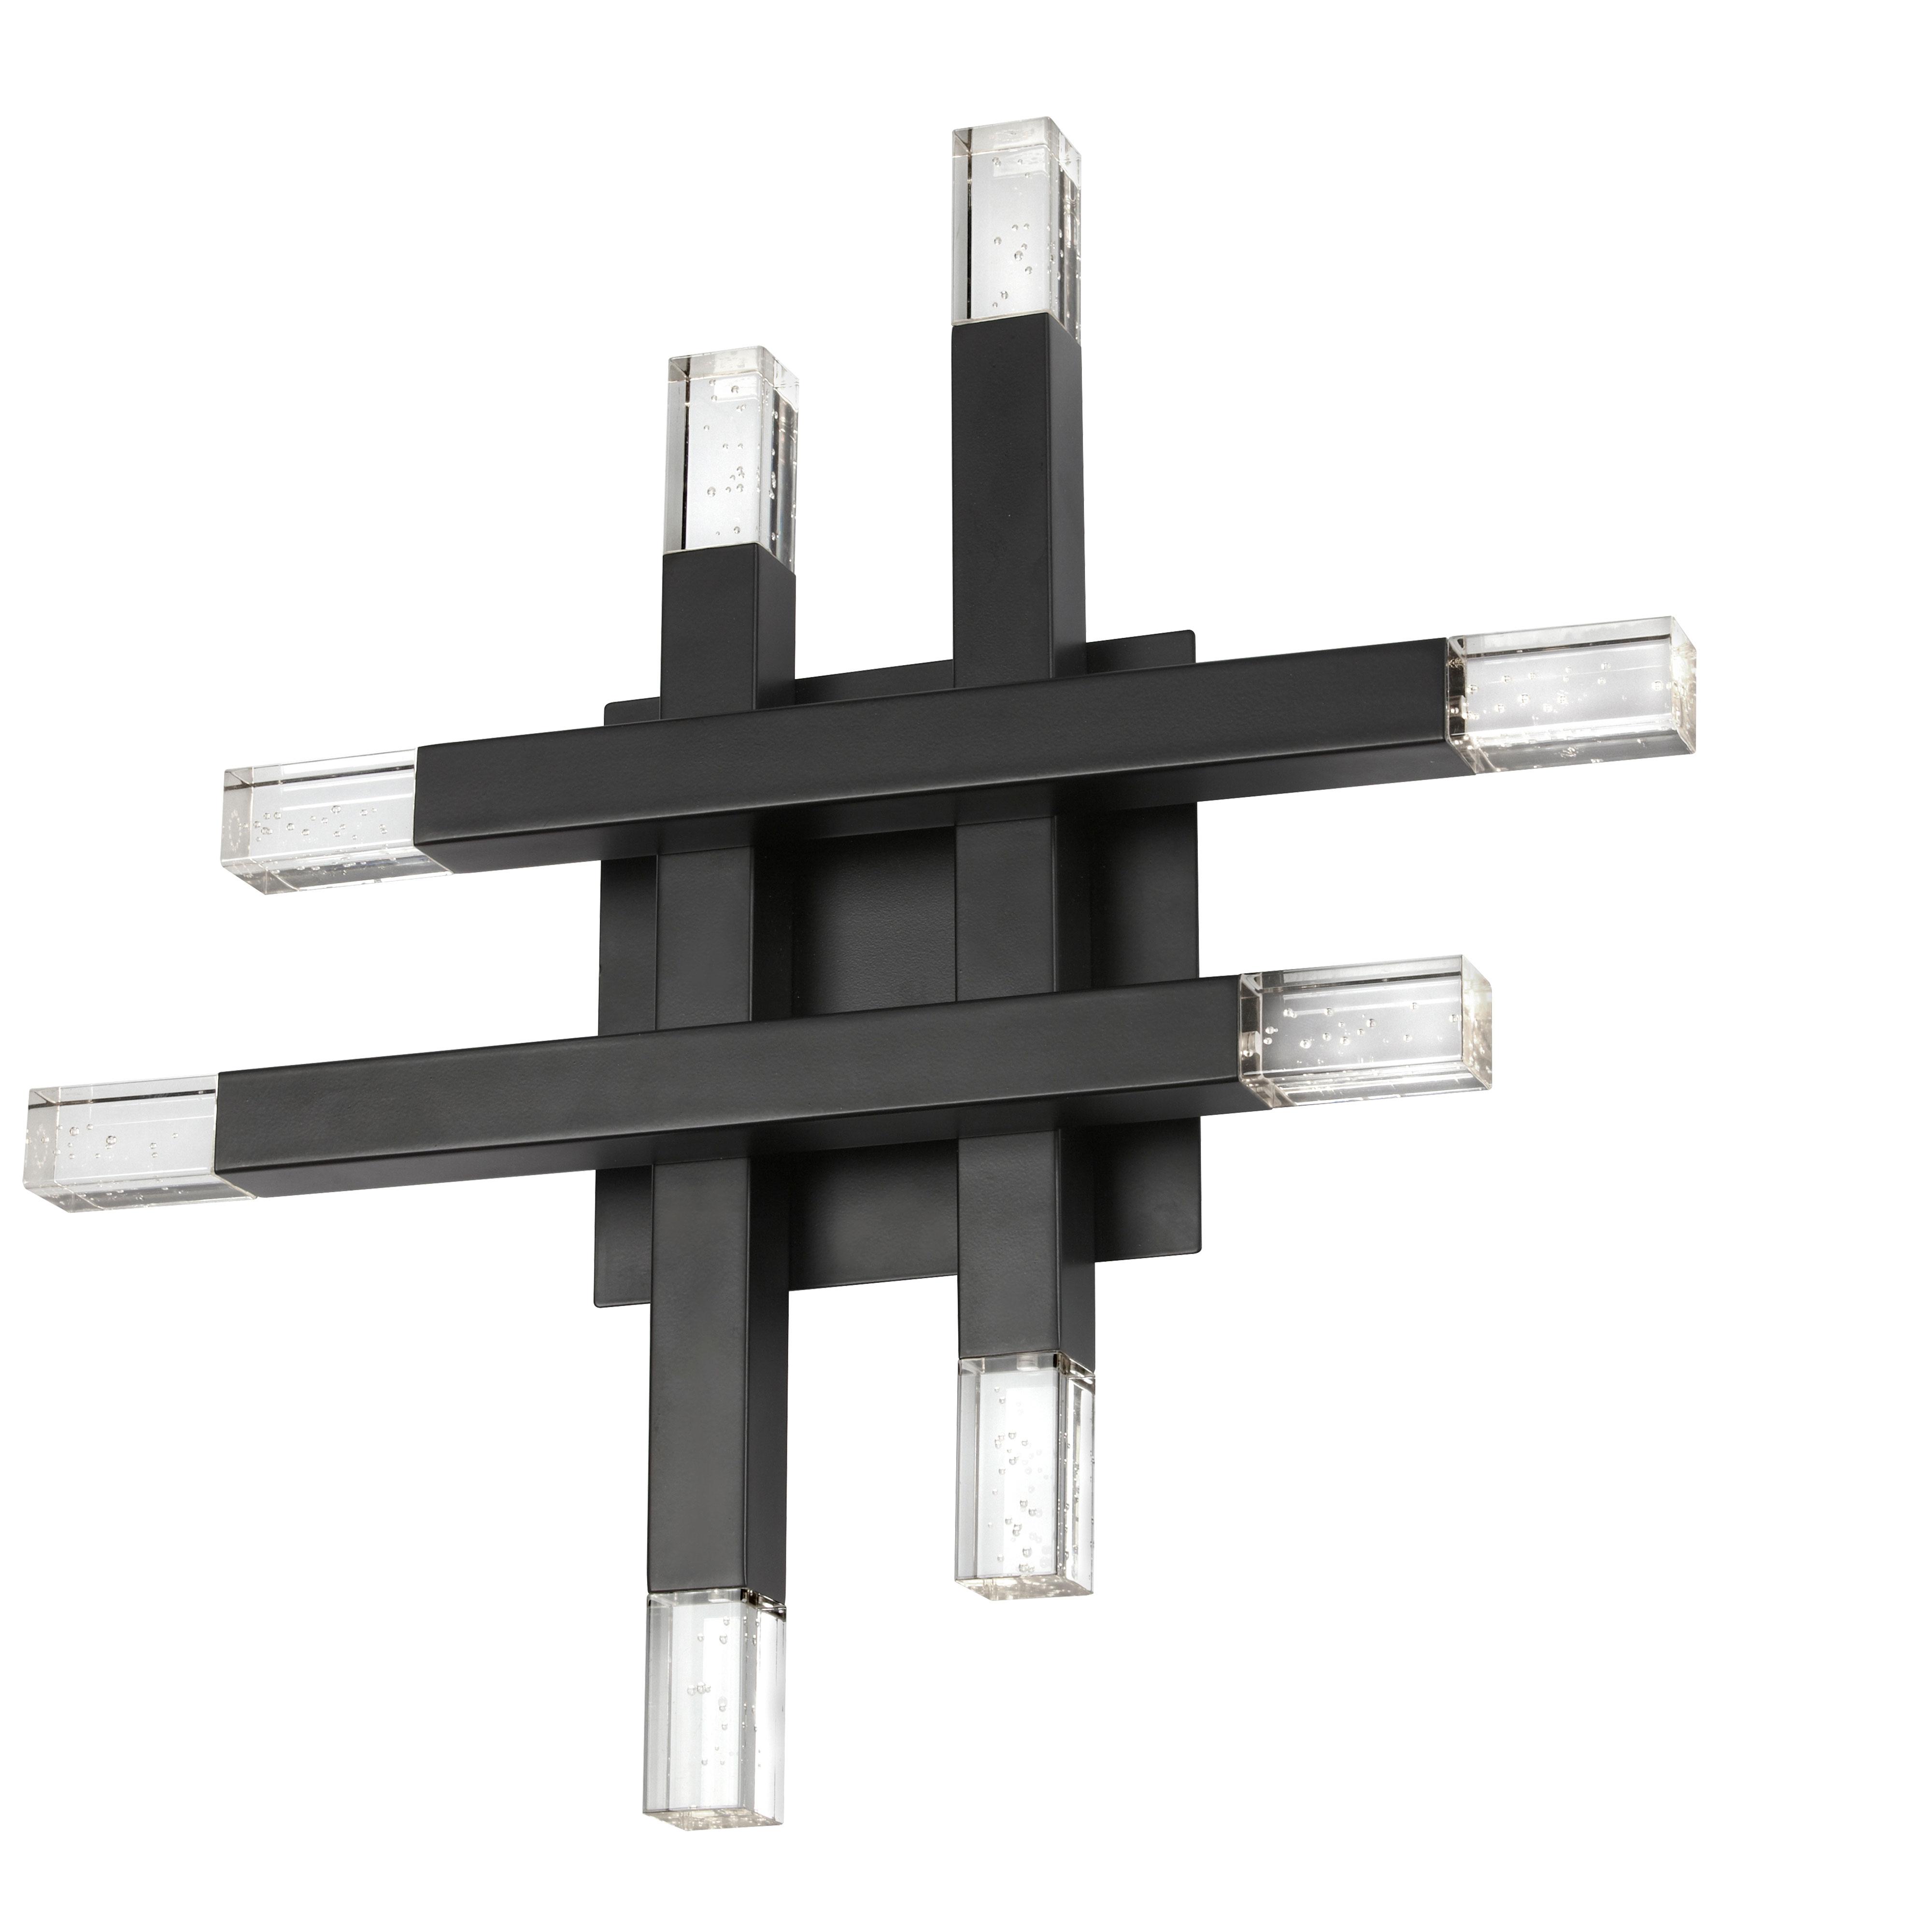 32W Matte Black Wall Sconce w/ Acrylic Diffuser